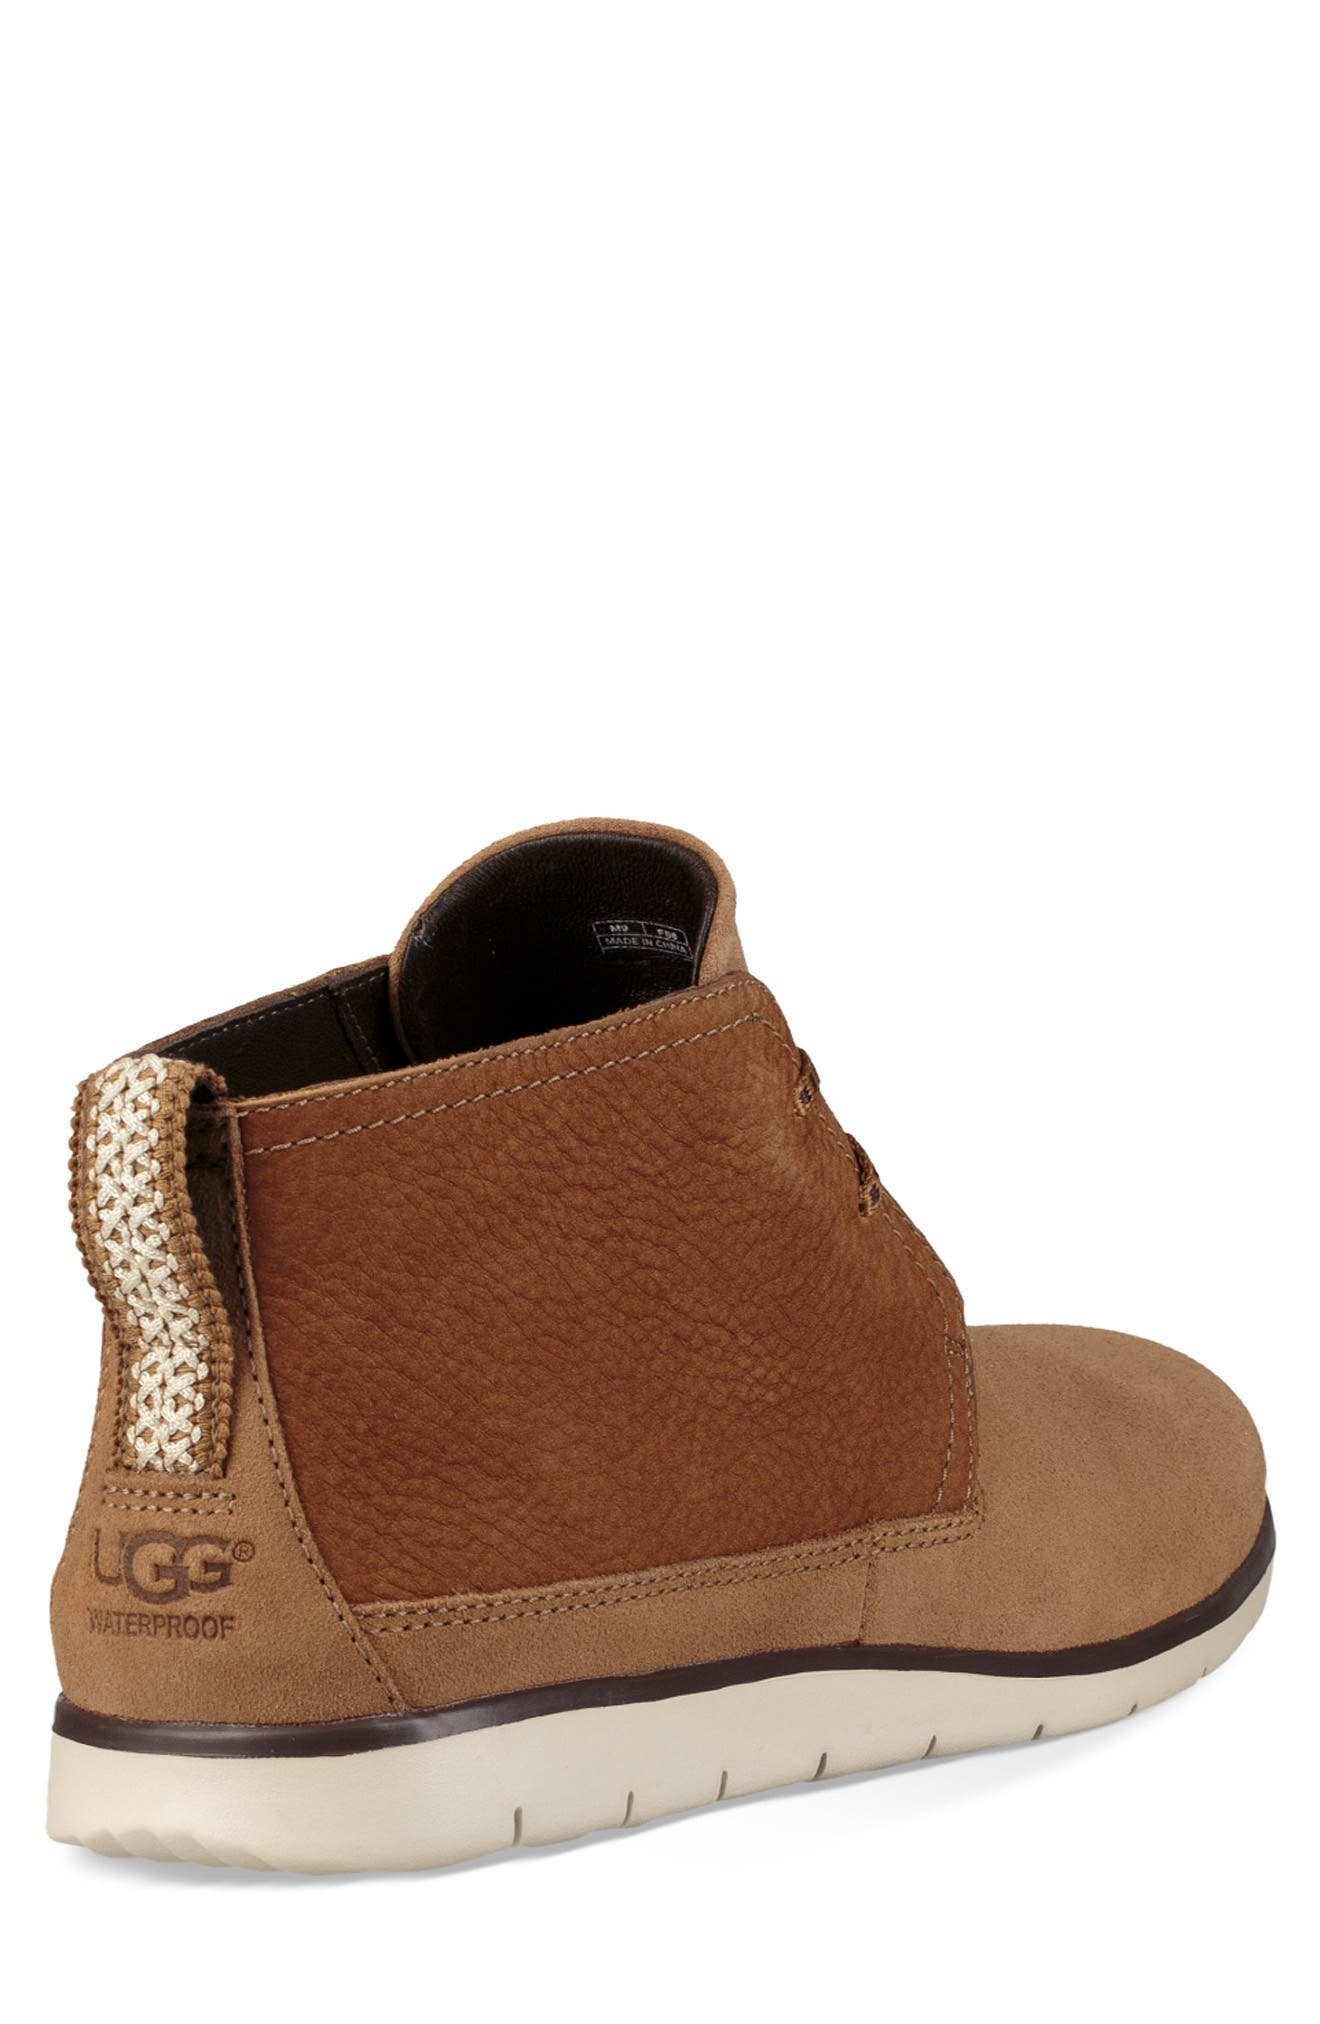 c5f0f4dc2e6 Men's UGG® Chukka Boots | Nordstrom